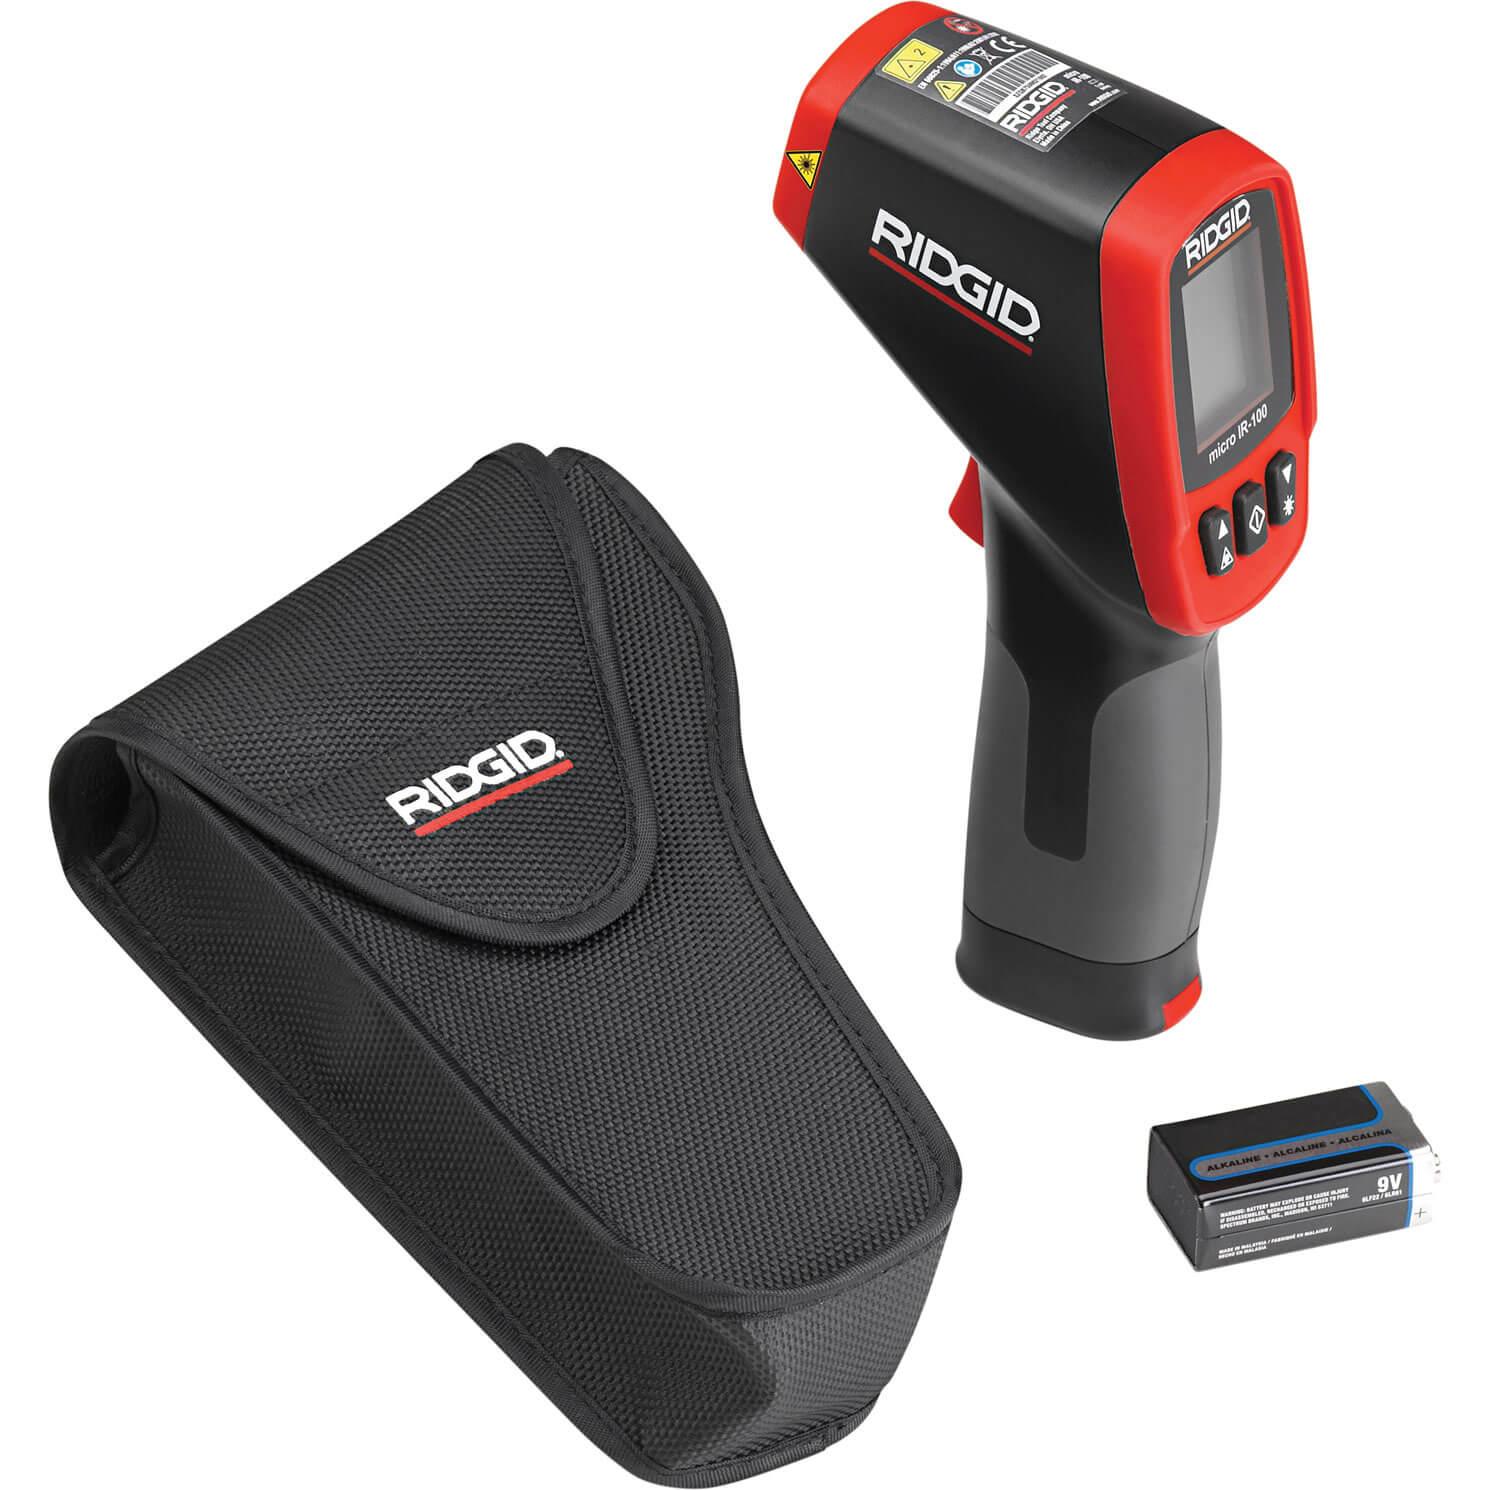 Ridgid Micro IR-200 Infrared Thermometer